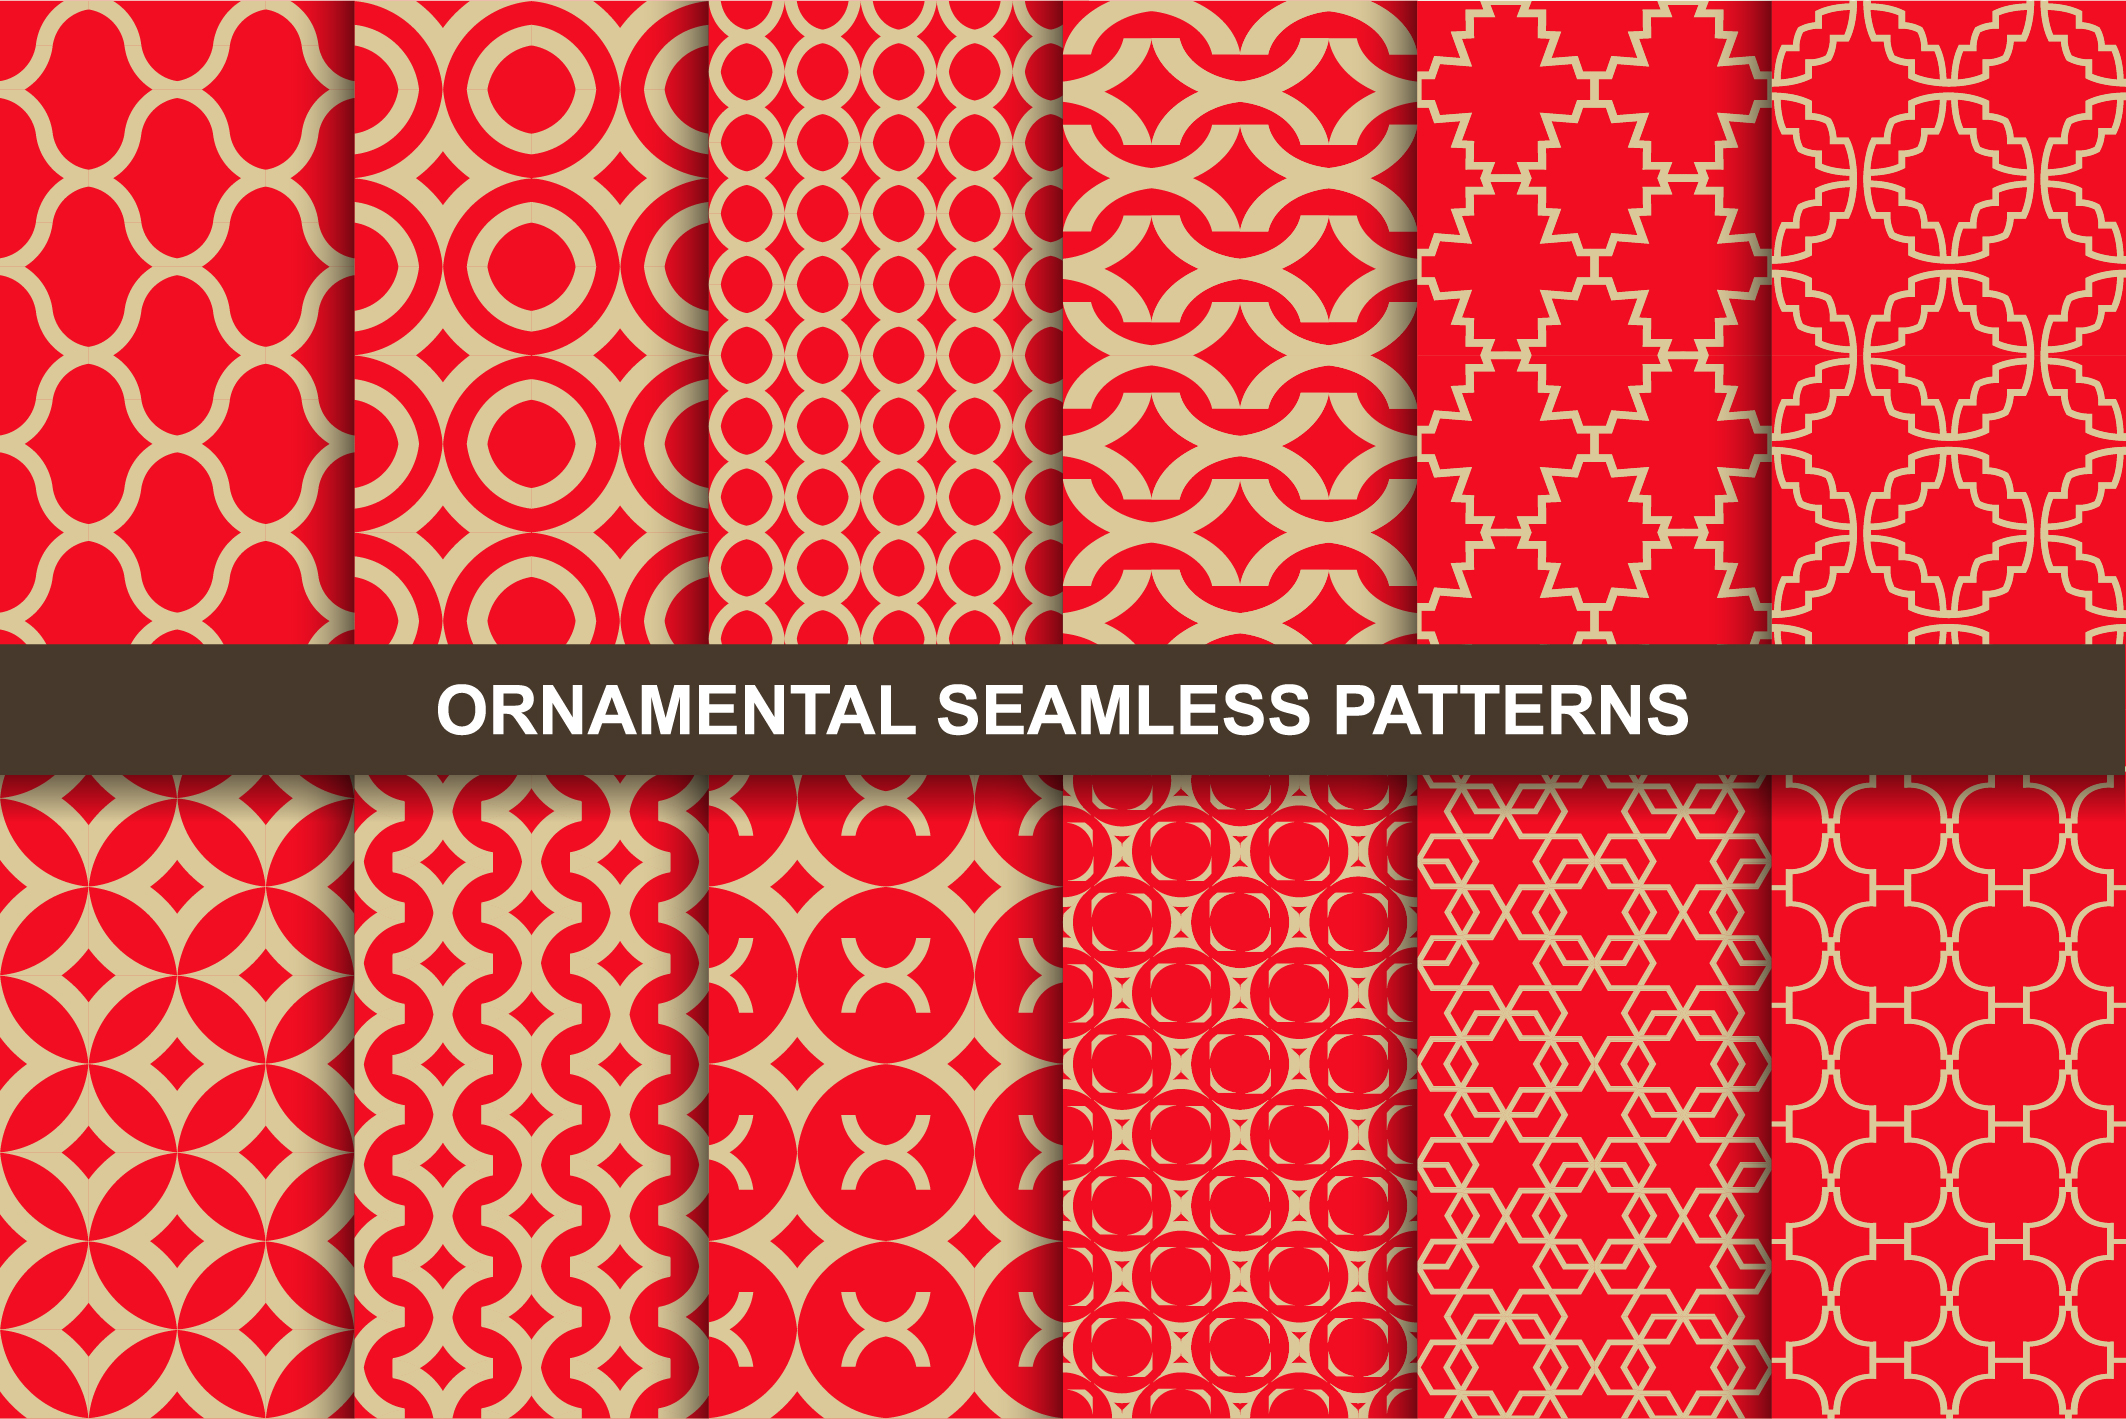 Luxury ornamental seamless patterns. example image 1